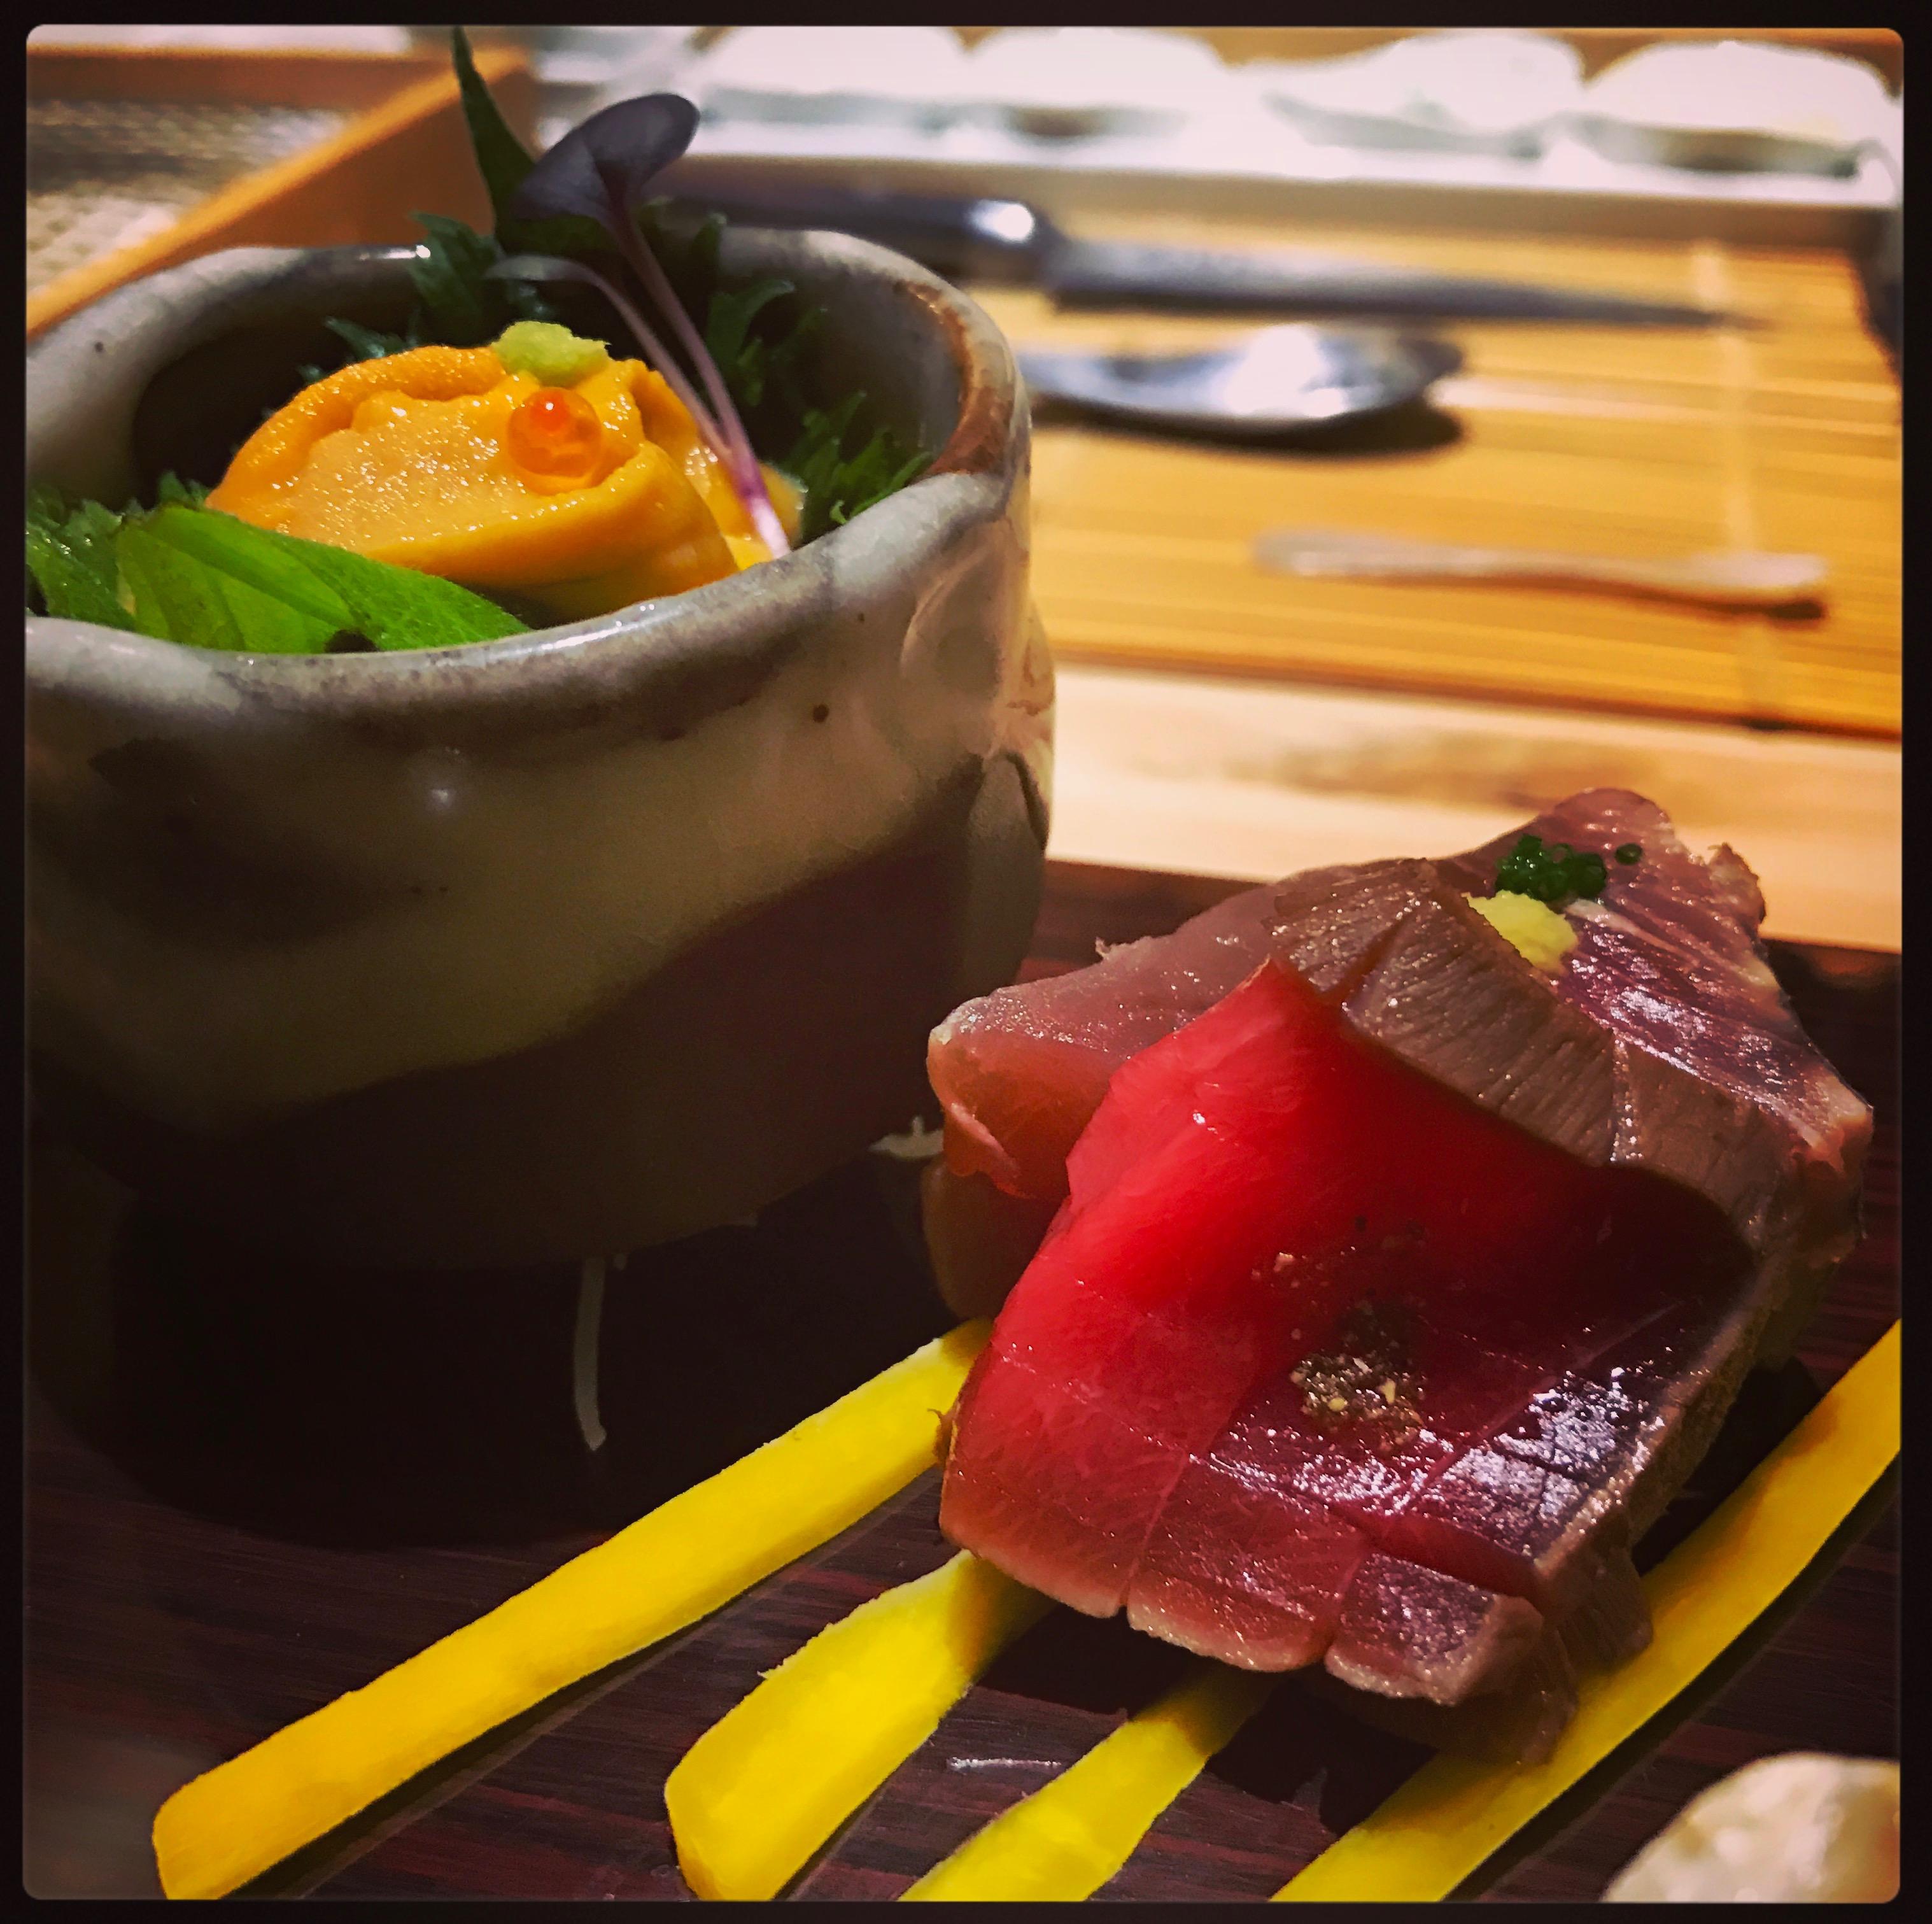 Sushi Ran - omakase - kaisu uni deep sea urchin - katsuo lightly cherrywood smoked bonito sashimi